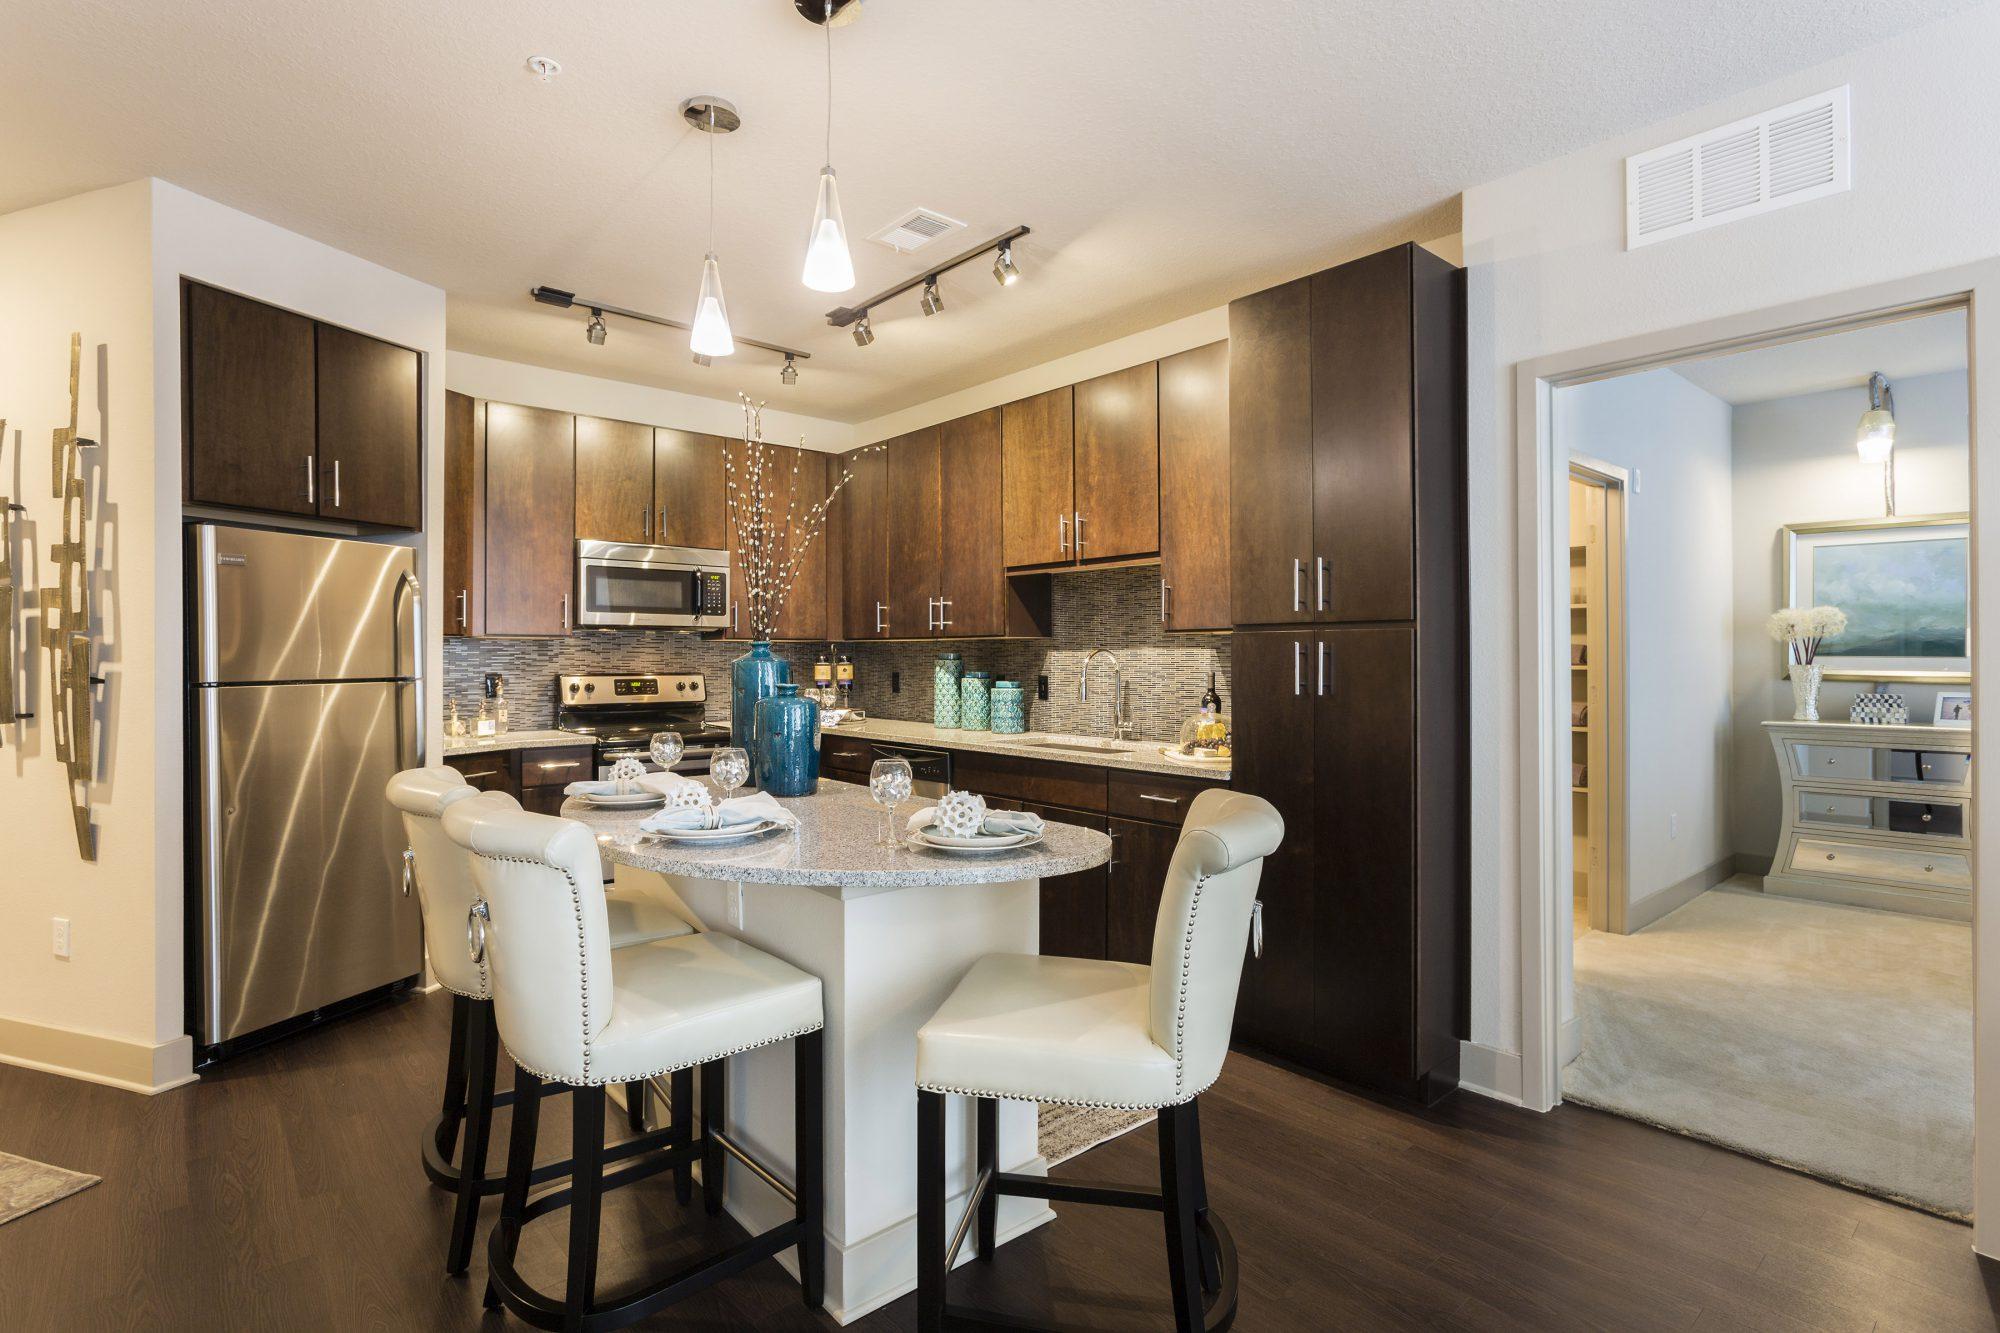 LandonHouse Apartments 2